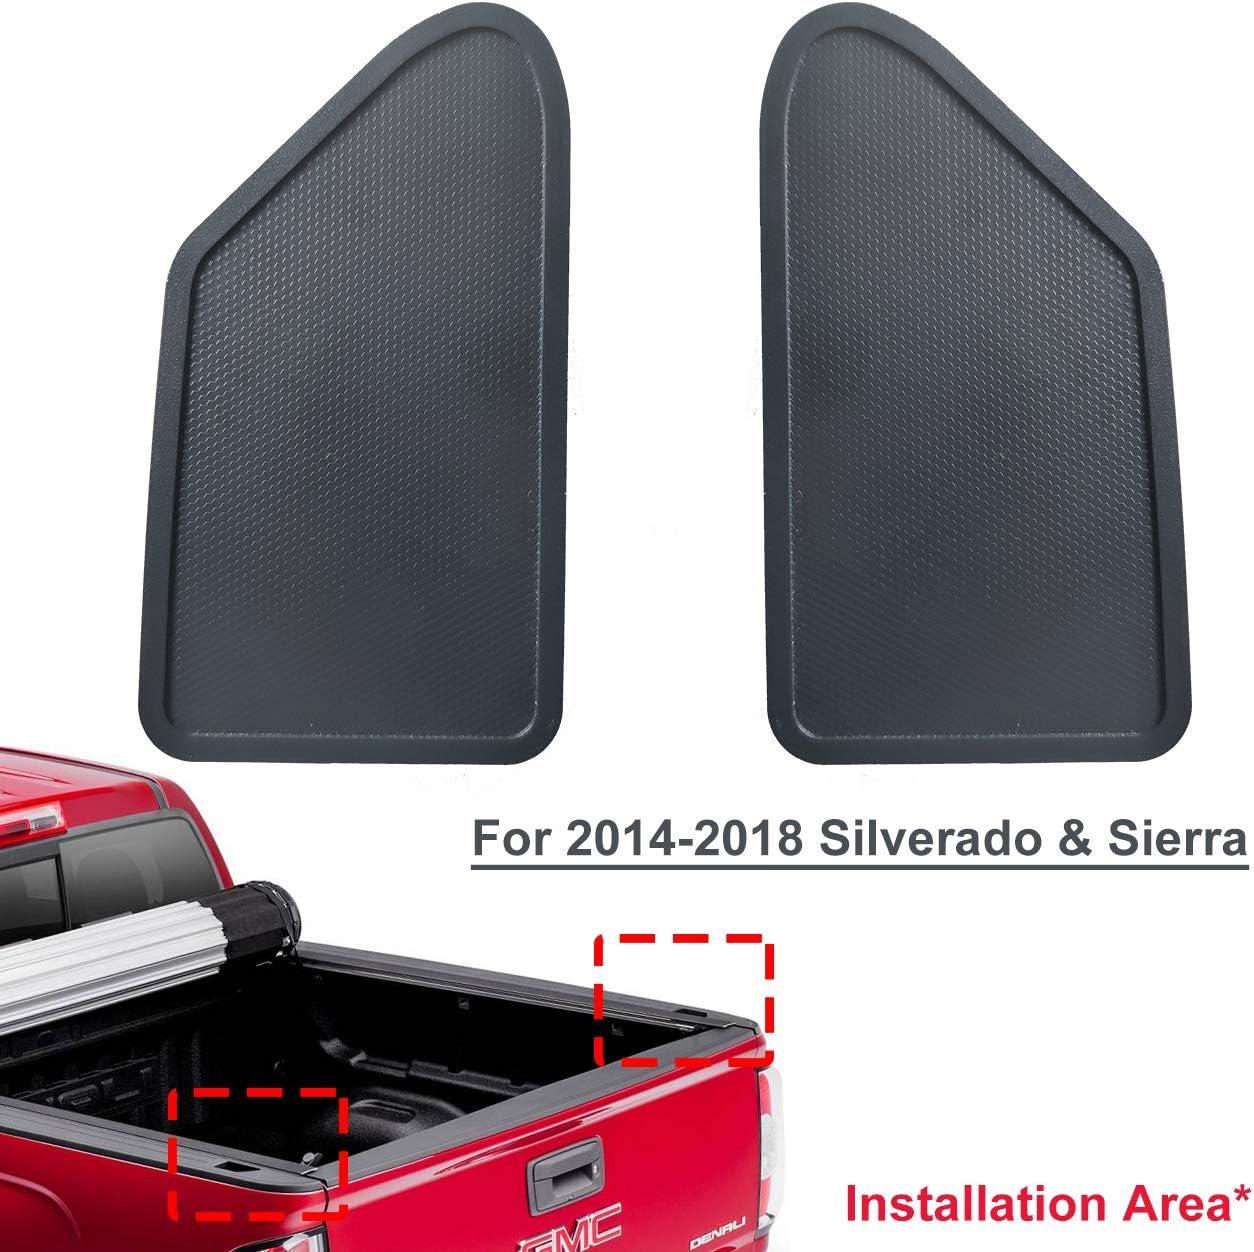 BASIKER 2X Auto Rear Bed Rail Stake Pocket Cover for Chevy Silverado /& GMC Sierra Dust-Proof Hole Plug 2014-2018